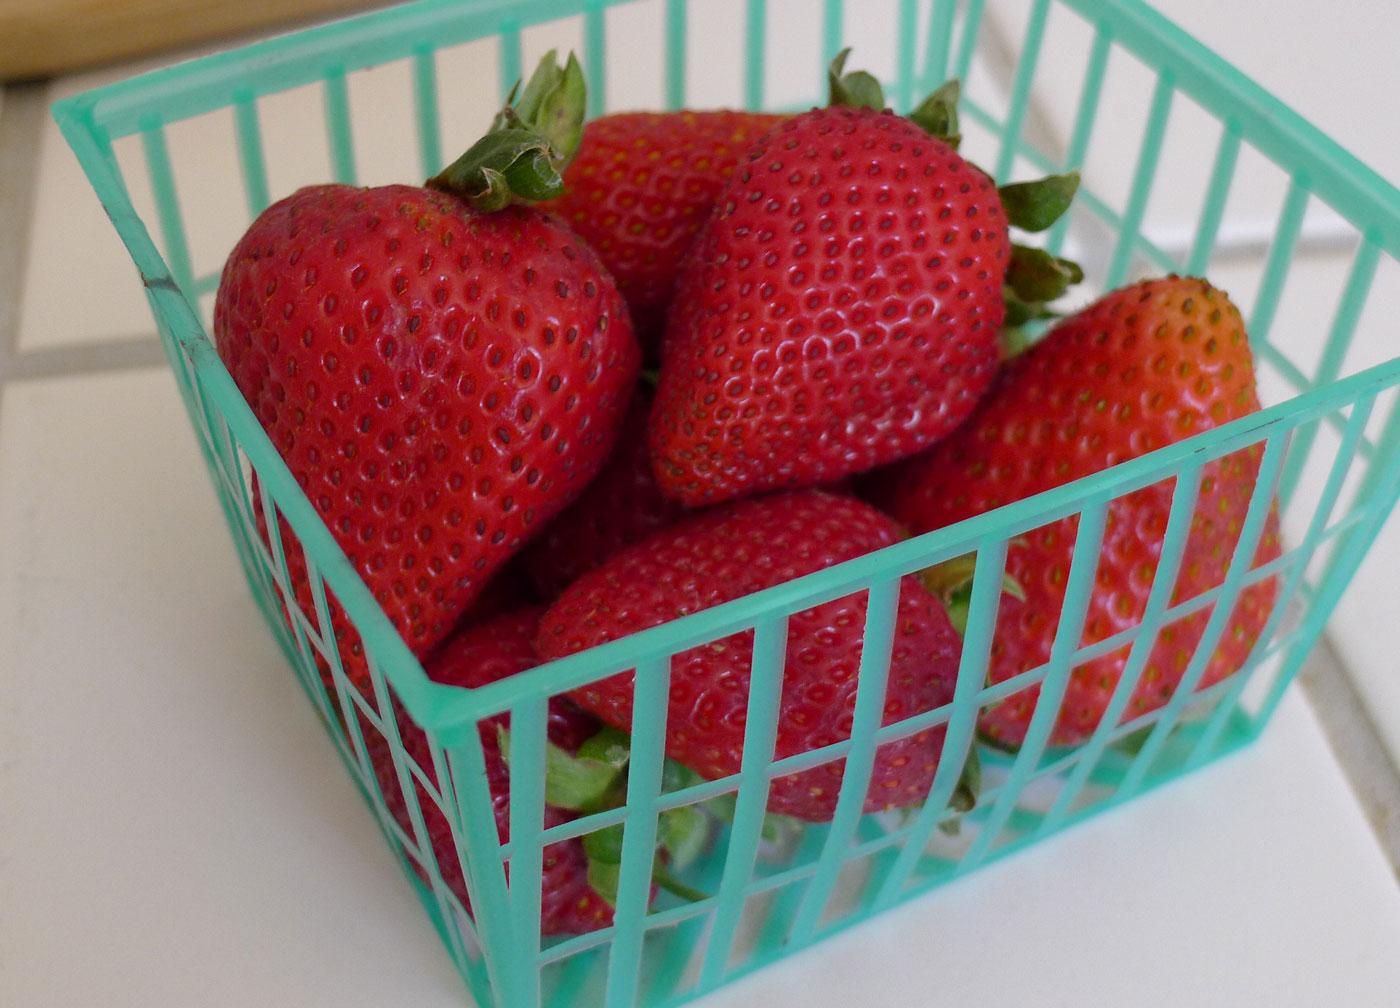 strawberries from the San Luis Obispo farmers market